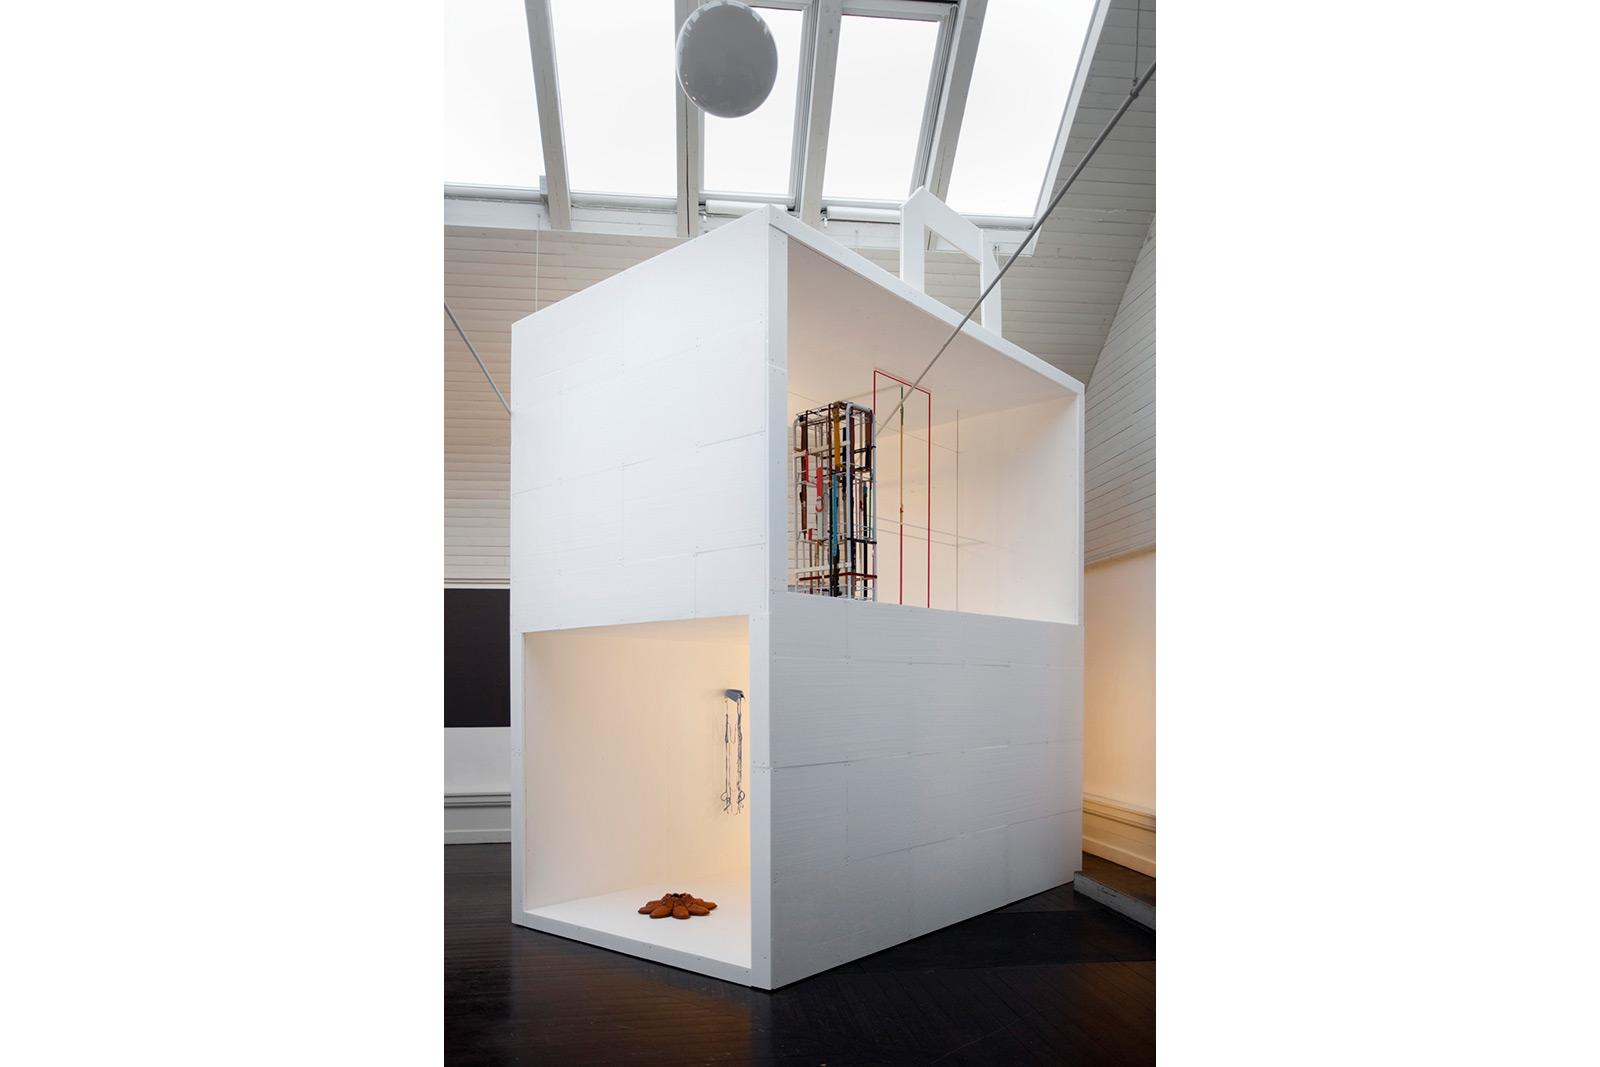 Den Frie Centre of Contemporary Art, Copenhagen